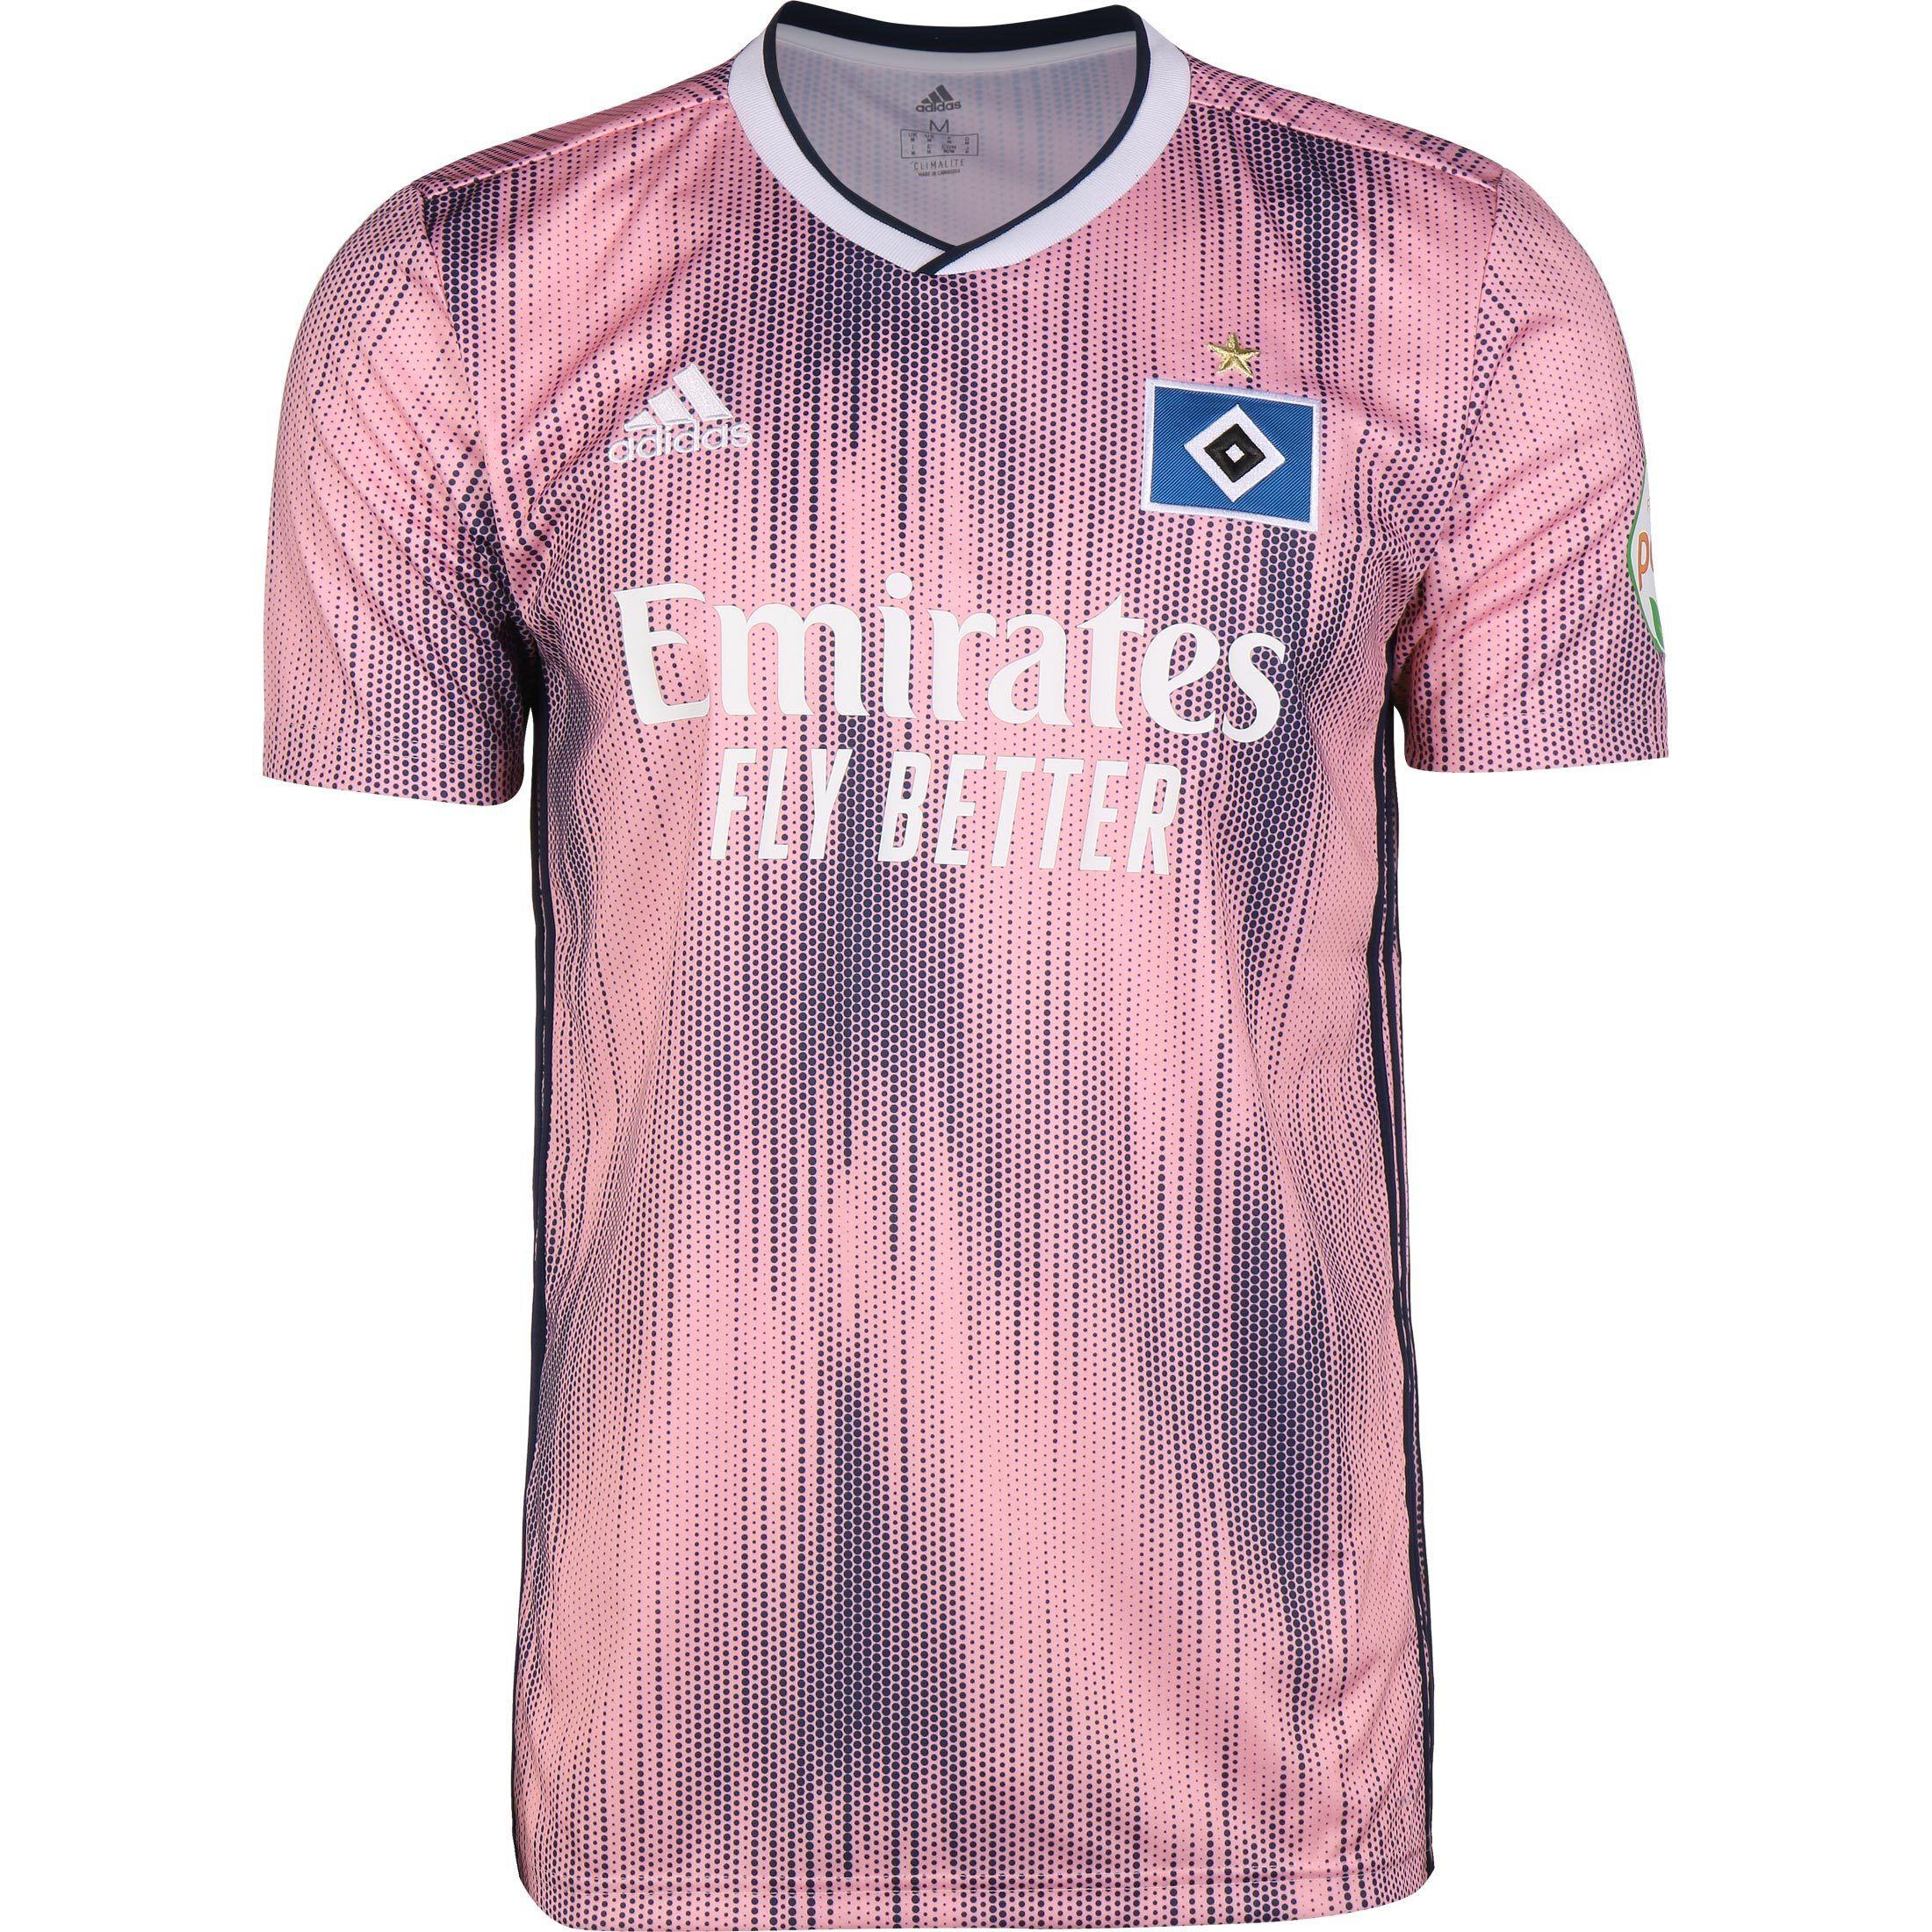 HSV DAMEN TRIKOT Gr. XS Hamburger SV Adidas blau weiß Shirt